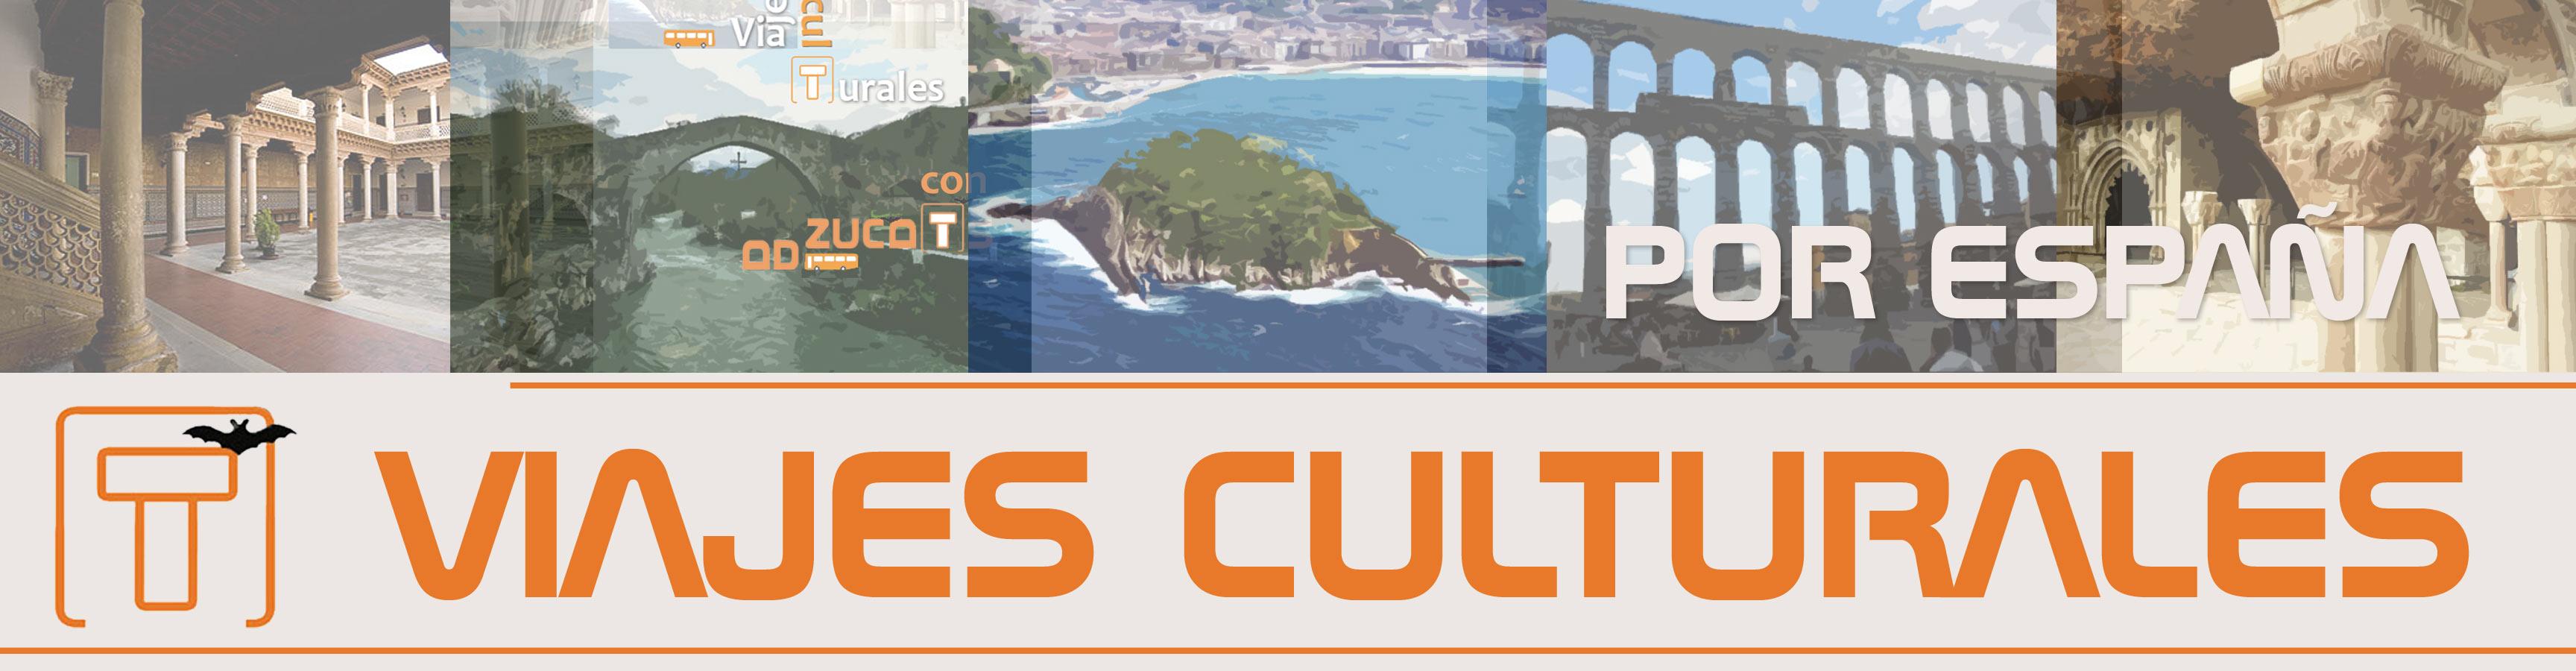 viajes españa grupos turismo cultural adzucats